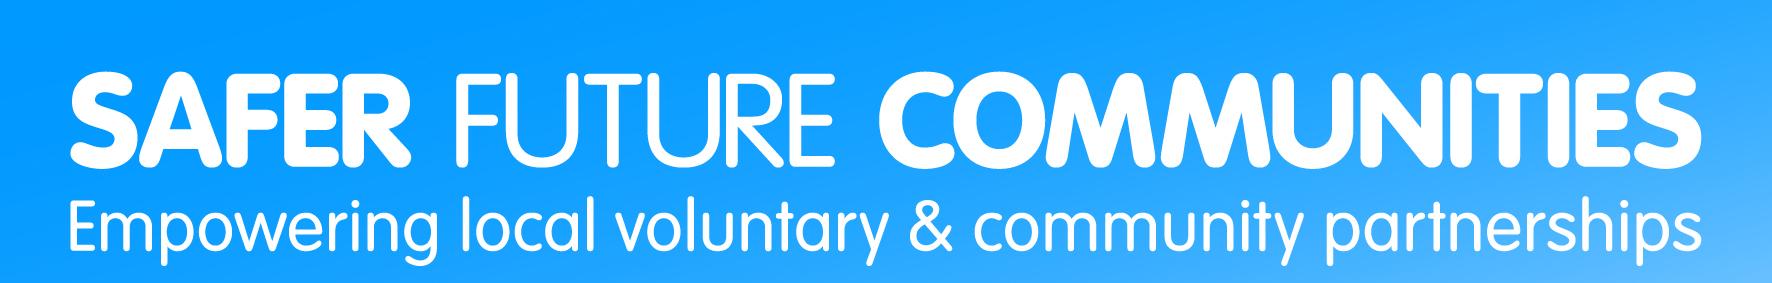 Safer Future Communities Logo